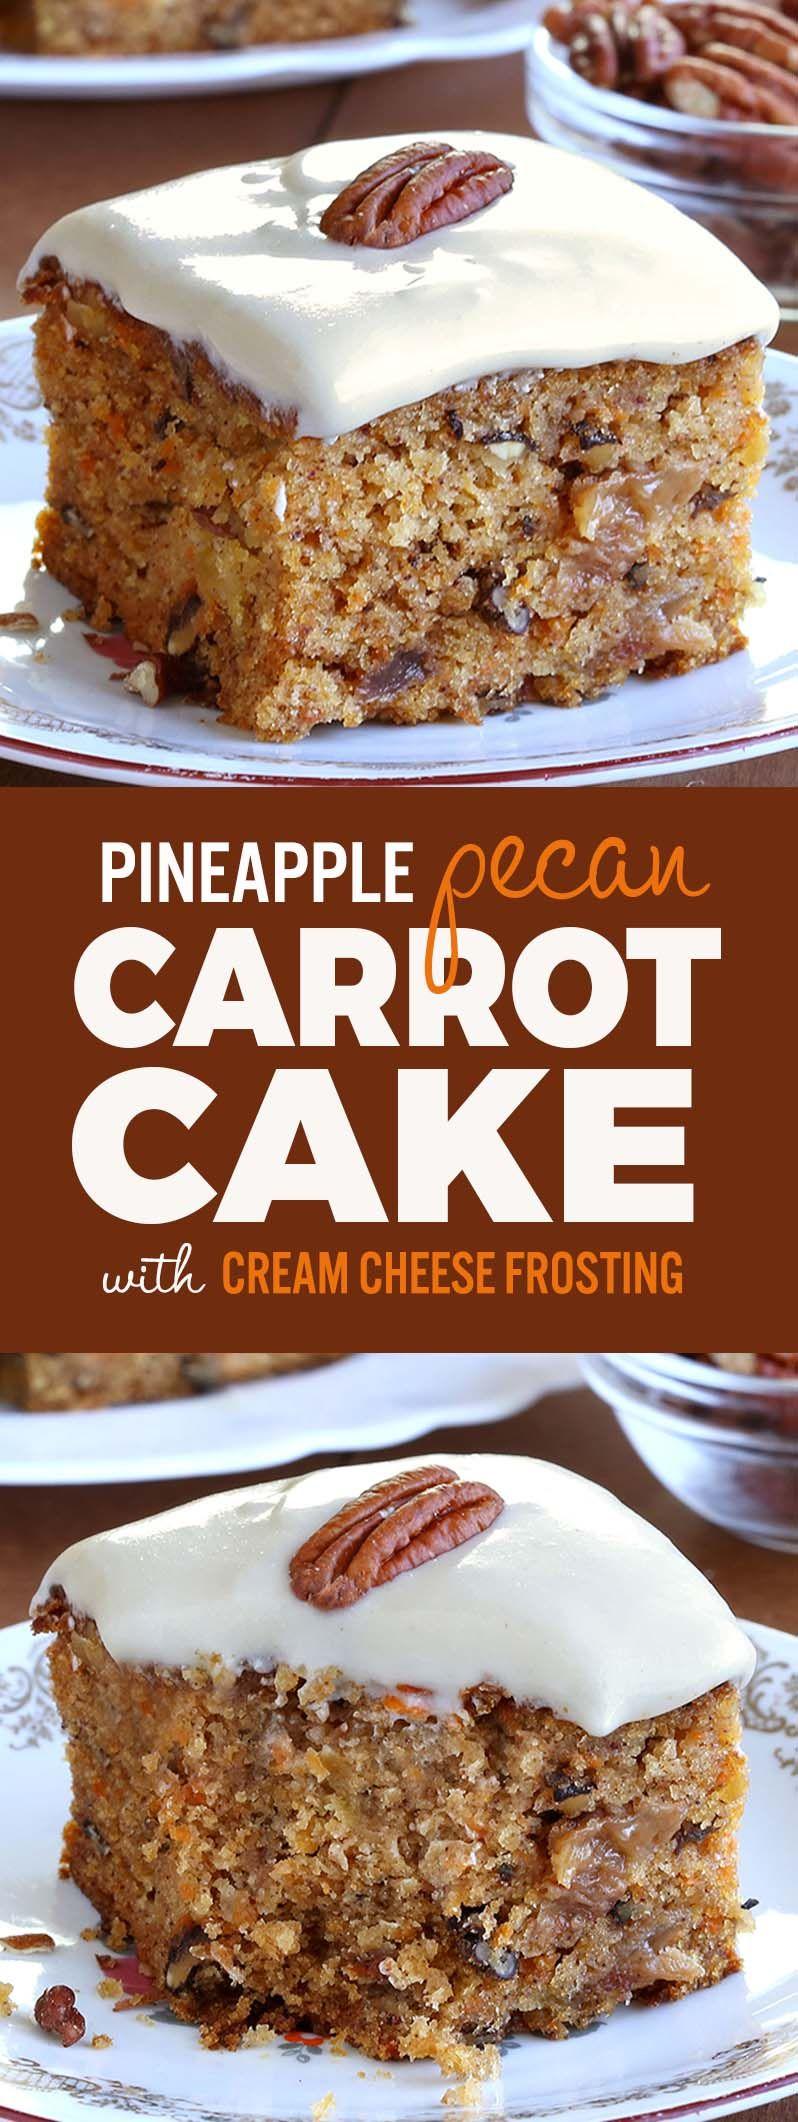 13 cake Pineapple baking ideas